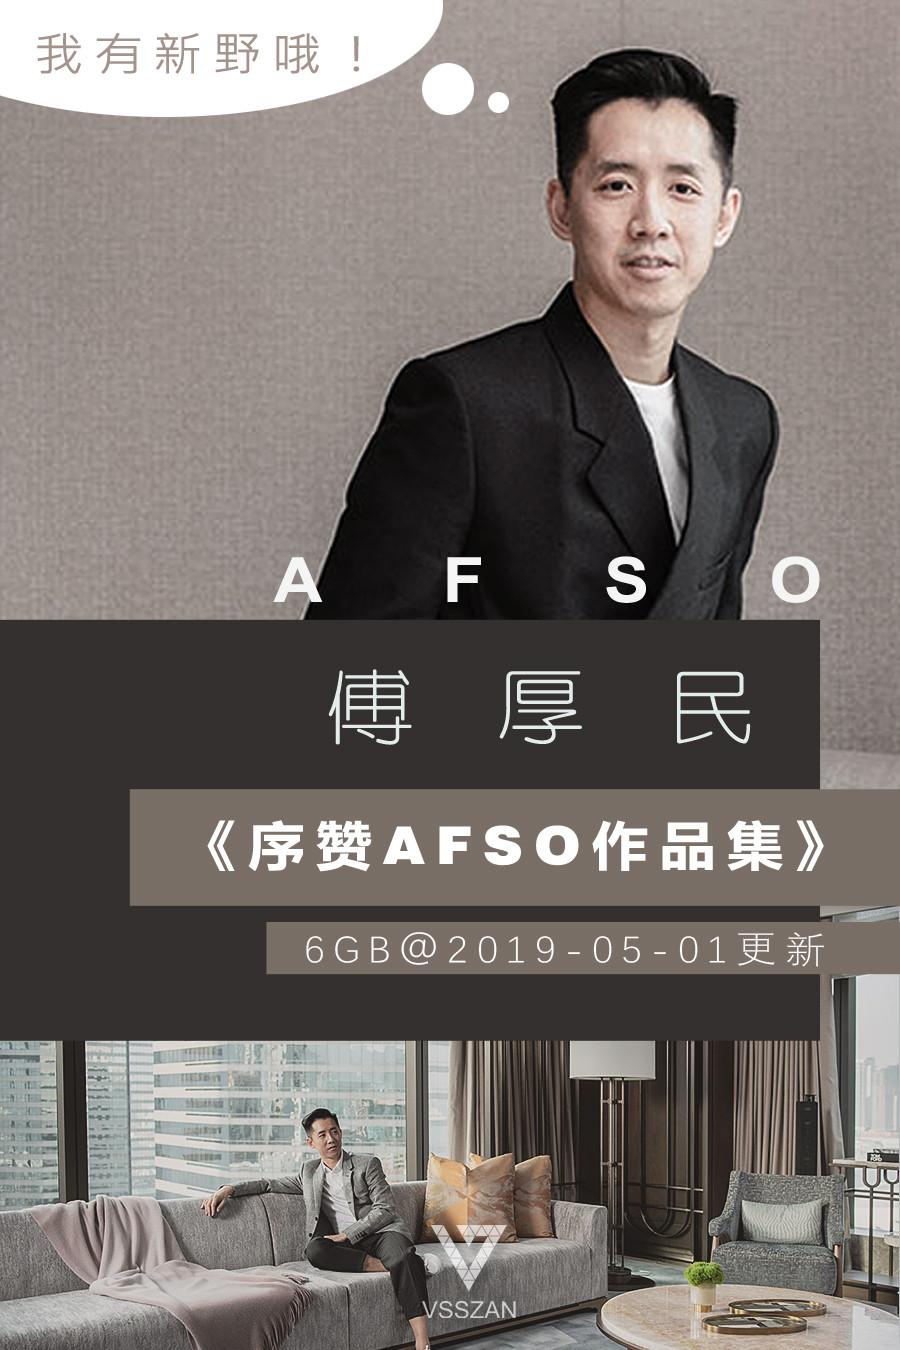 ad_AFSO20190501.jpg